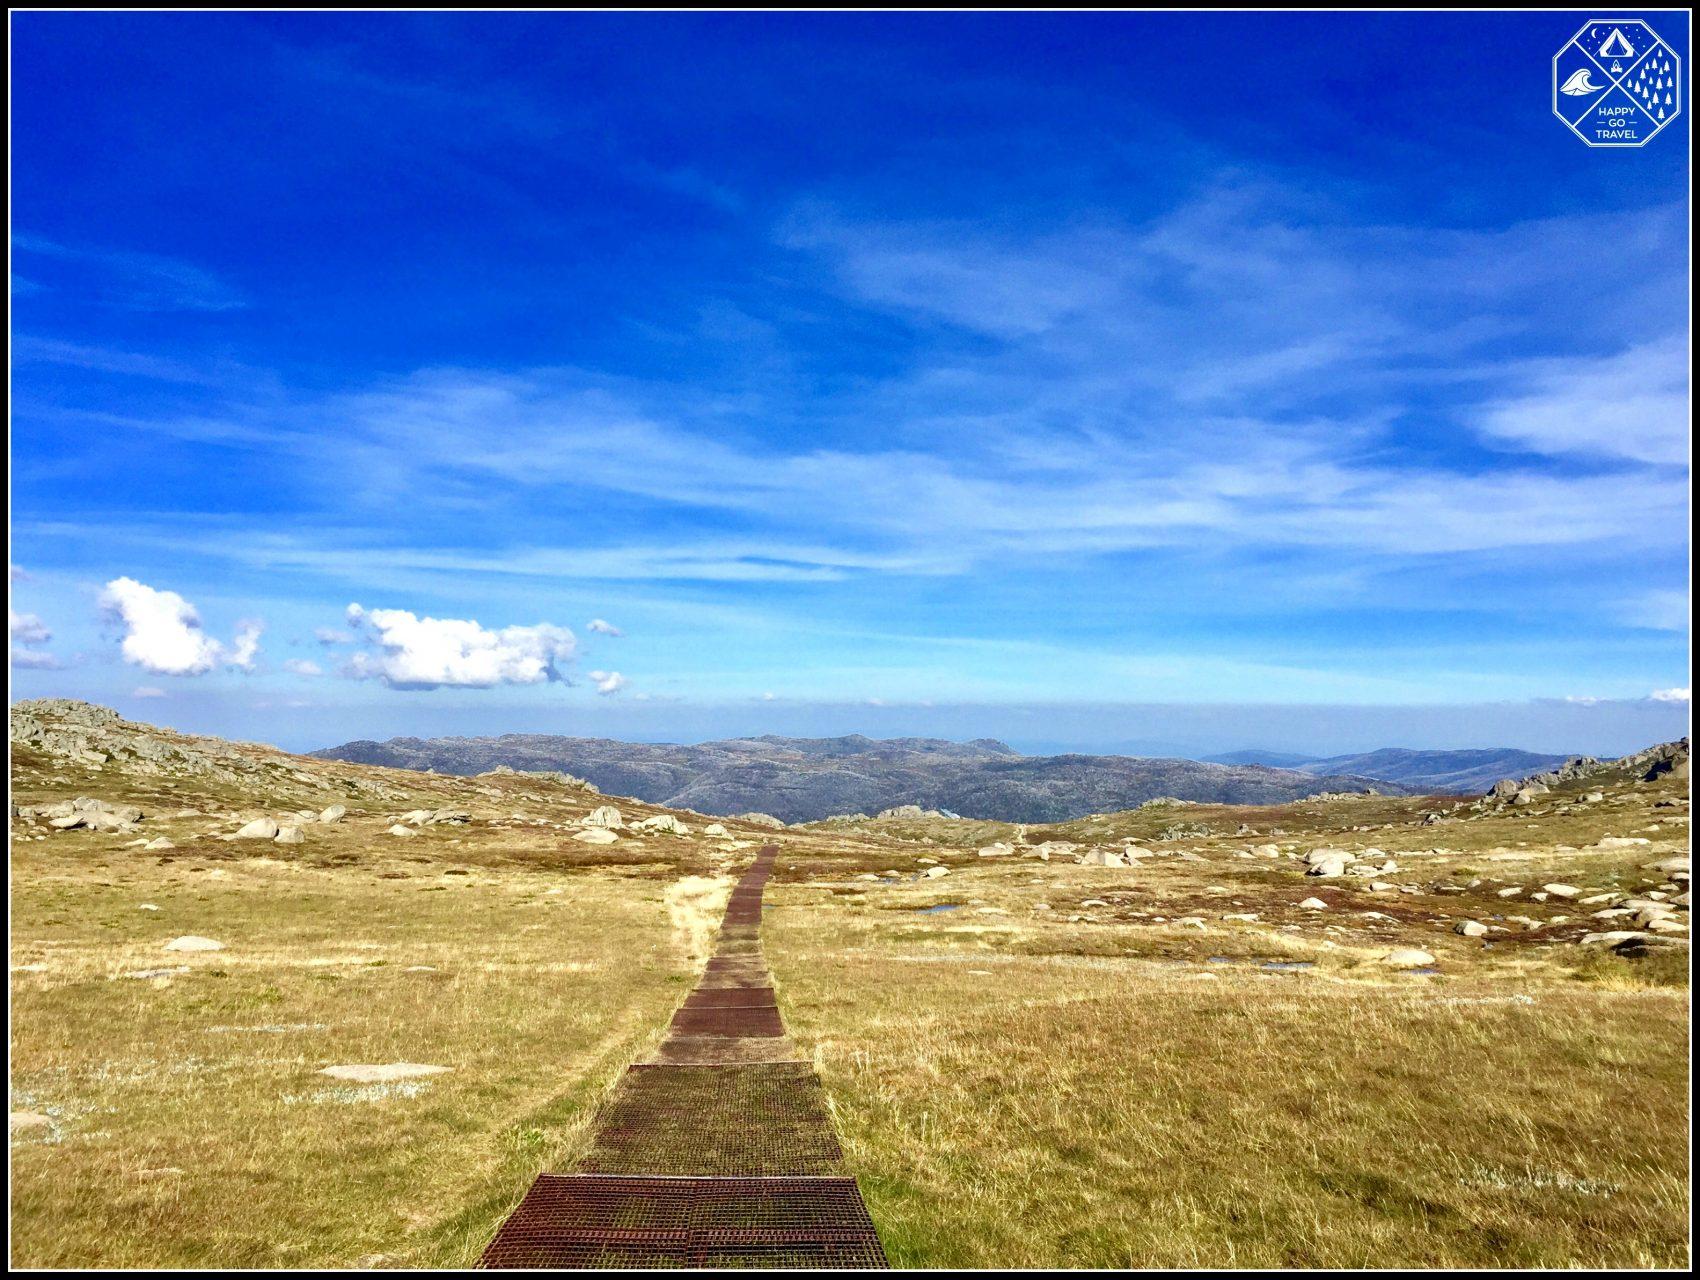 Hiking Mount Kosciuszko | walkway up Australia's highest mountain